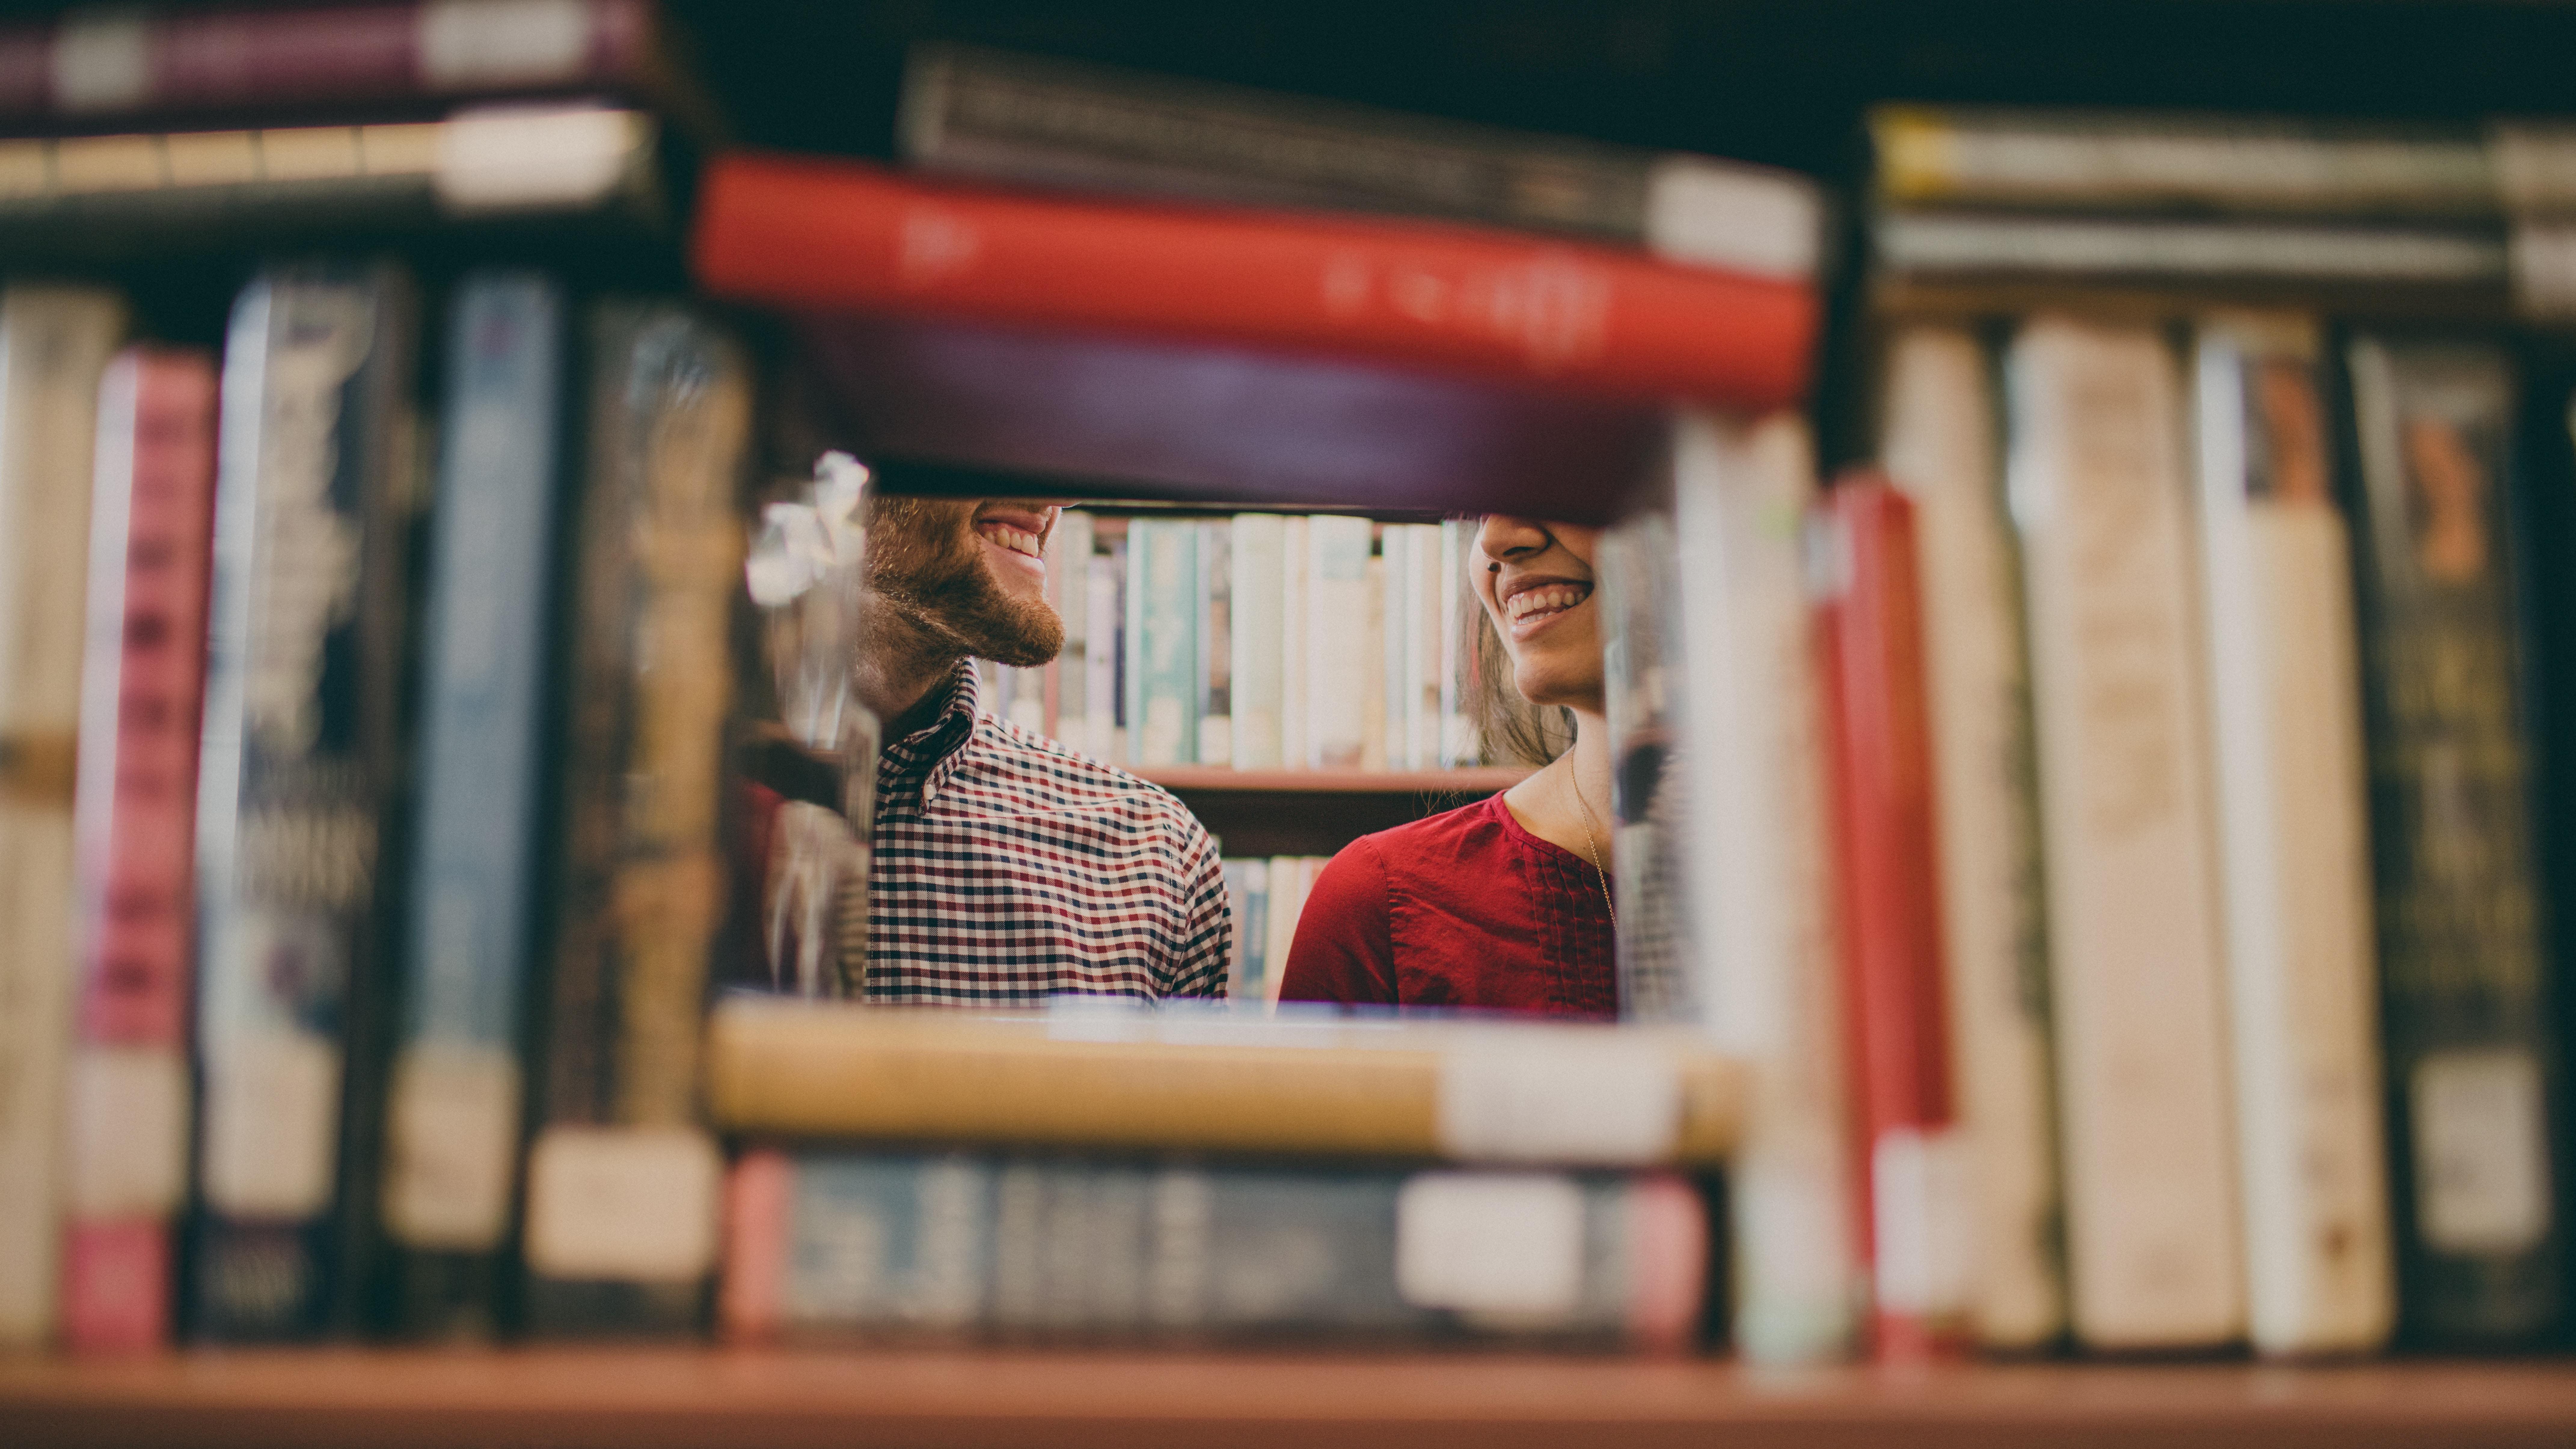 arrange book on shelf